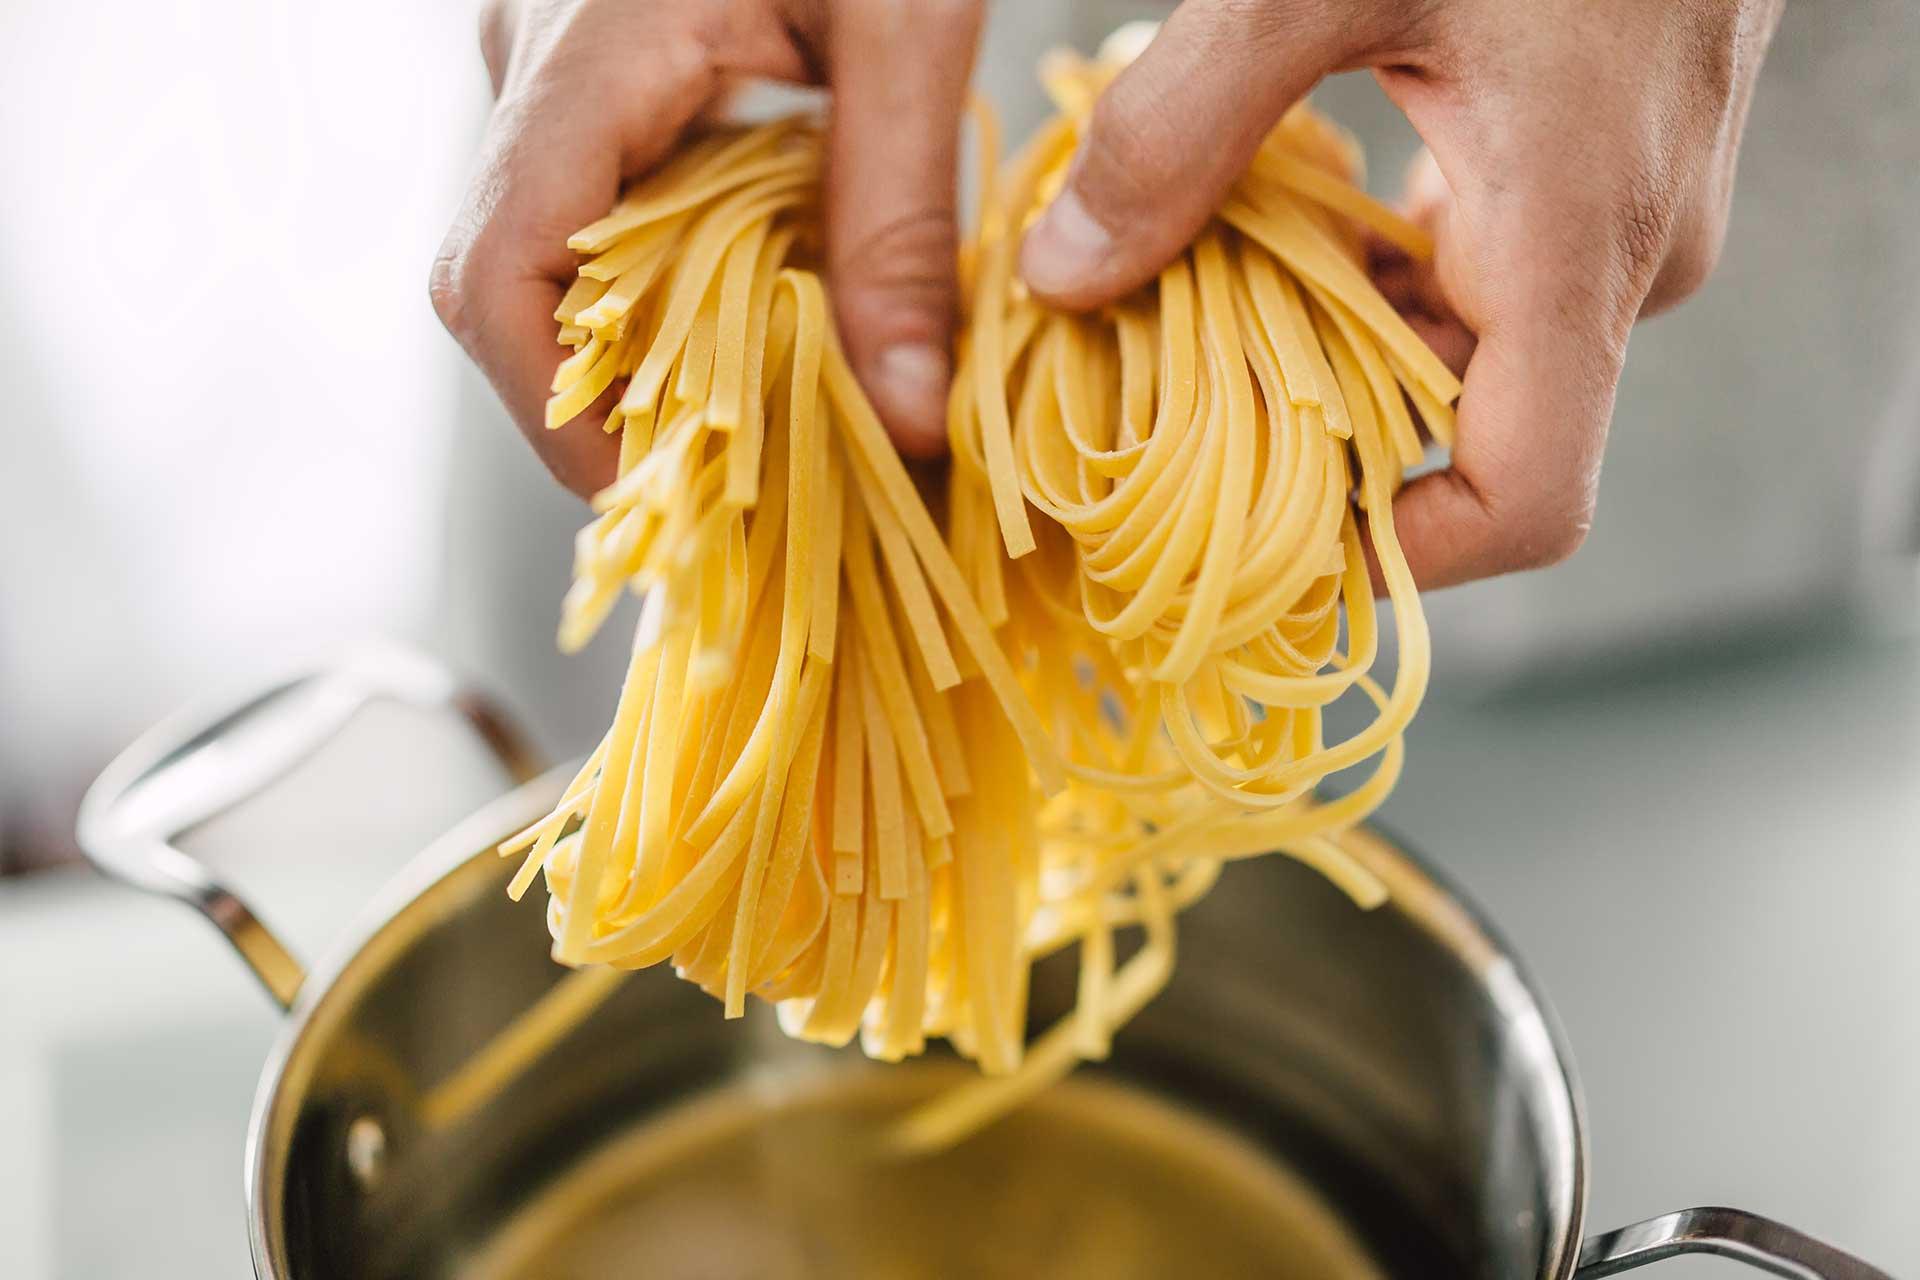 Clases de cocina desde casa